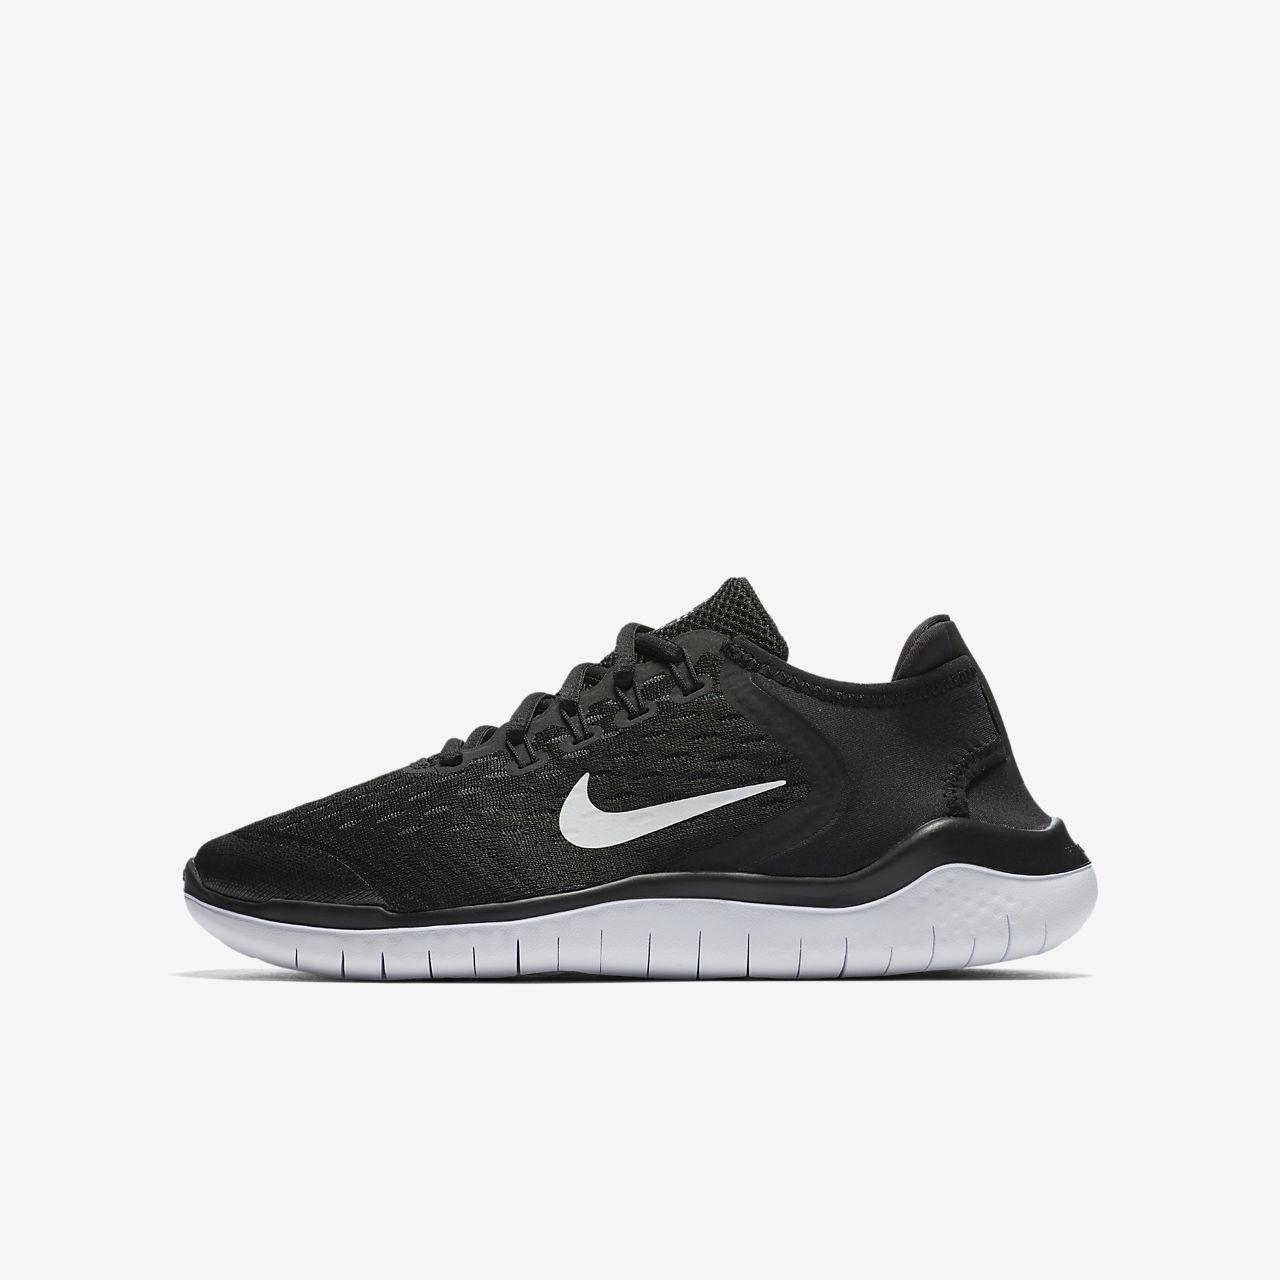 Nike Free RN 2018 Zapatillas de running - Niño a. Nike.com ES 623e1dd66a06d